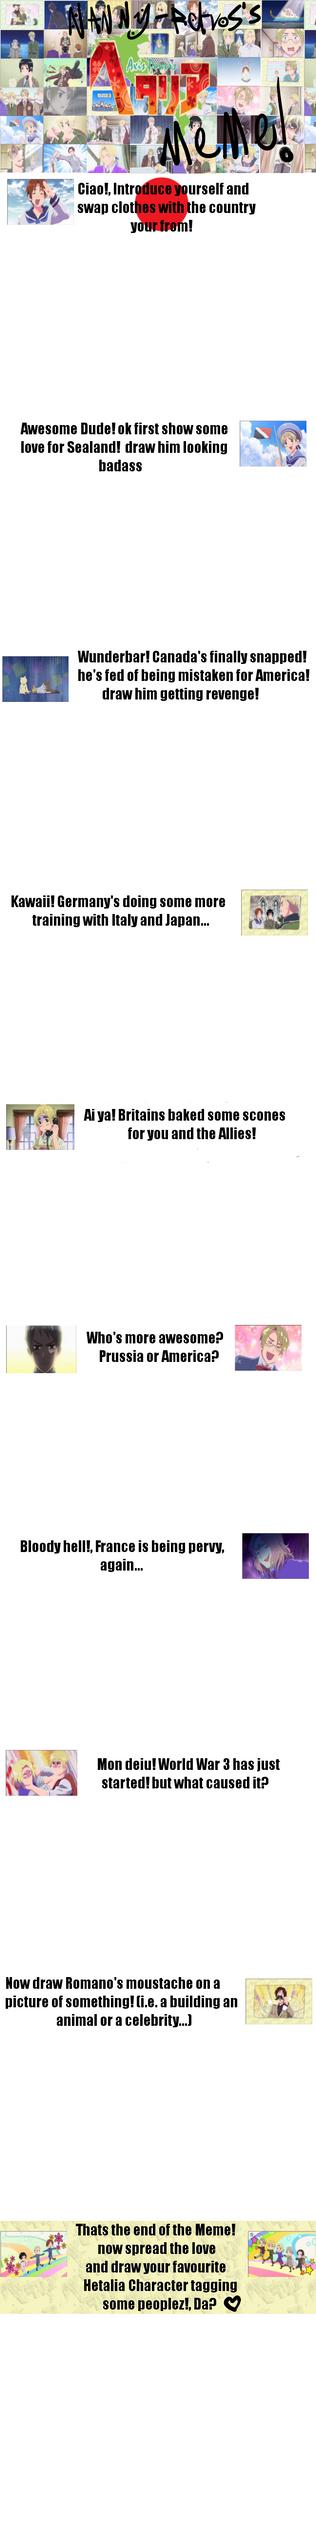 Hetalia Meme by Nanny-Retro